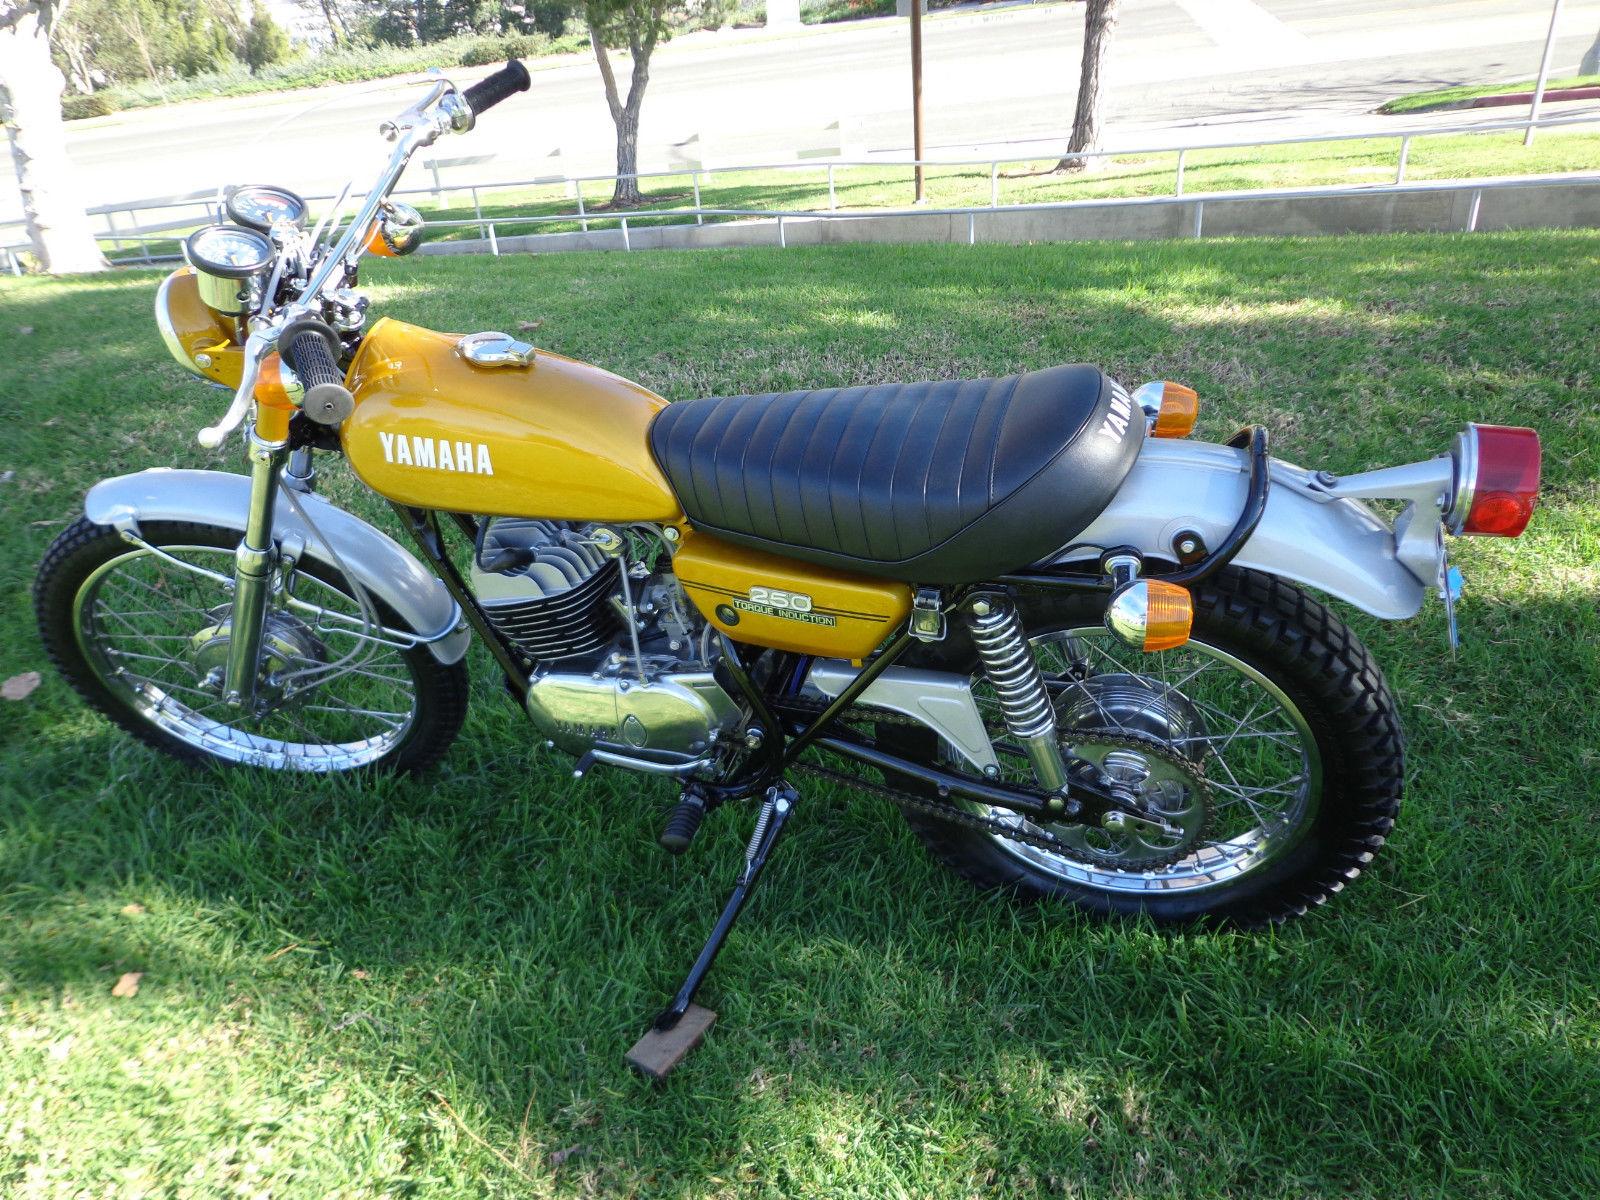 Yamaha DT250 - 1972 - Left Side, Tank, Seat and Frame.